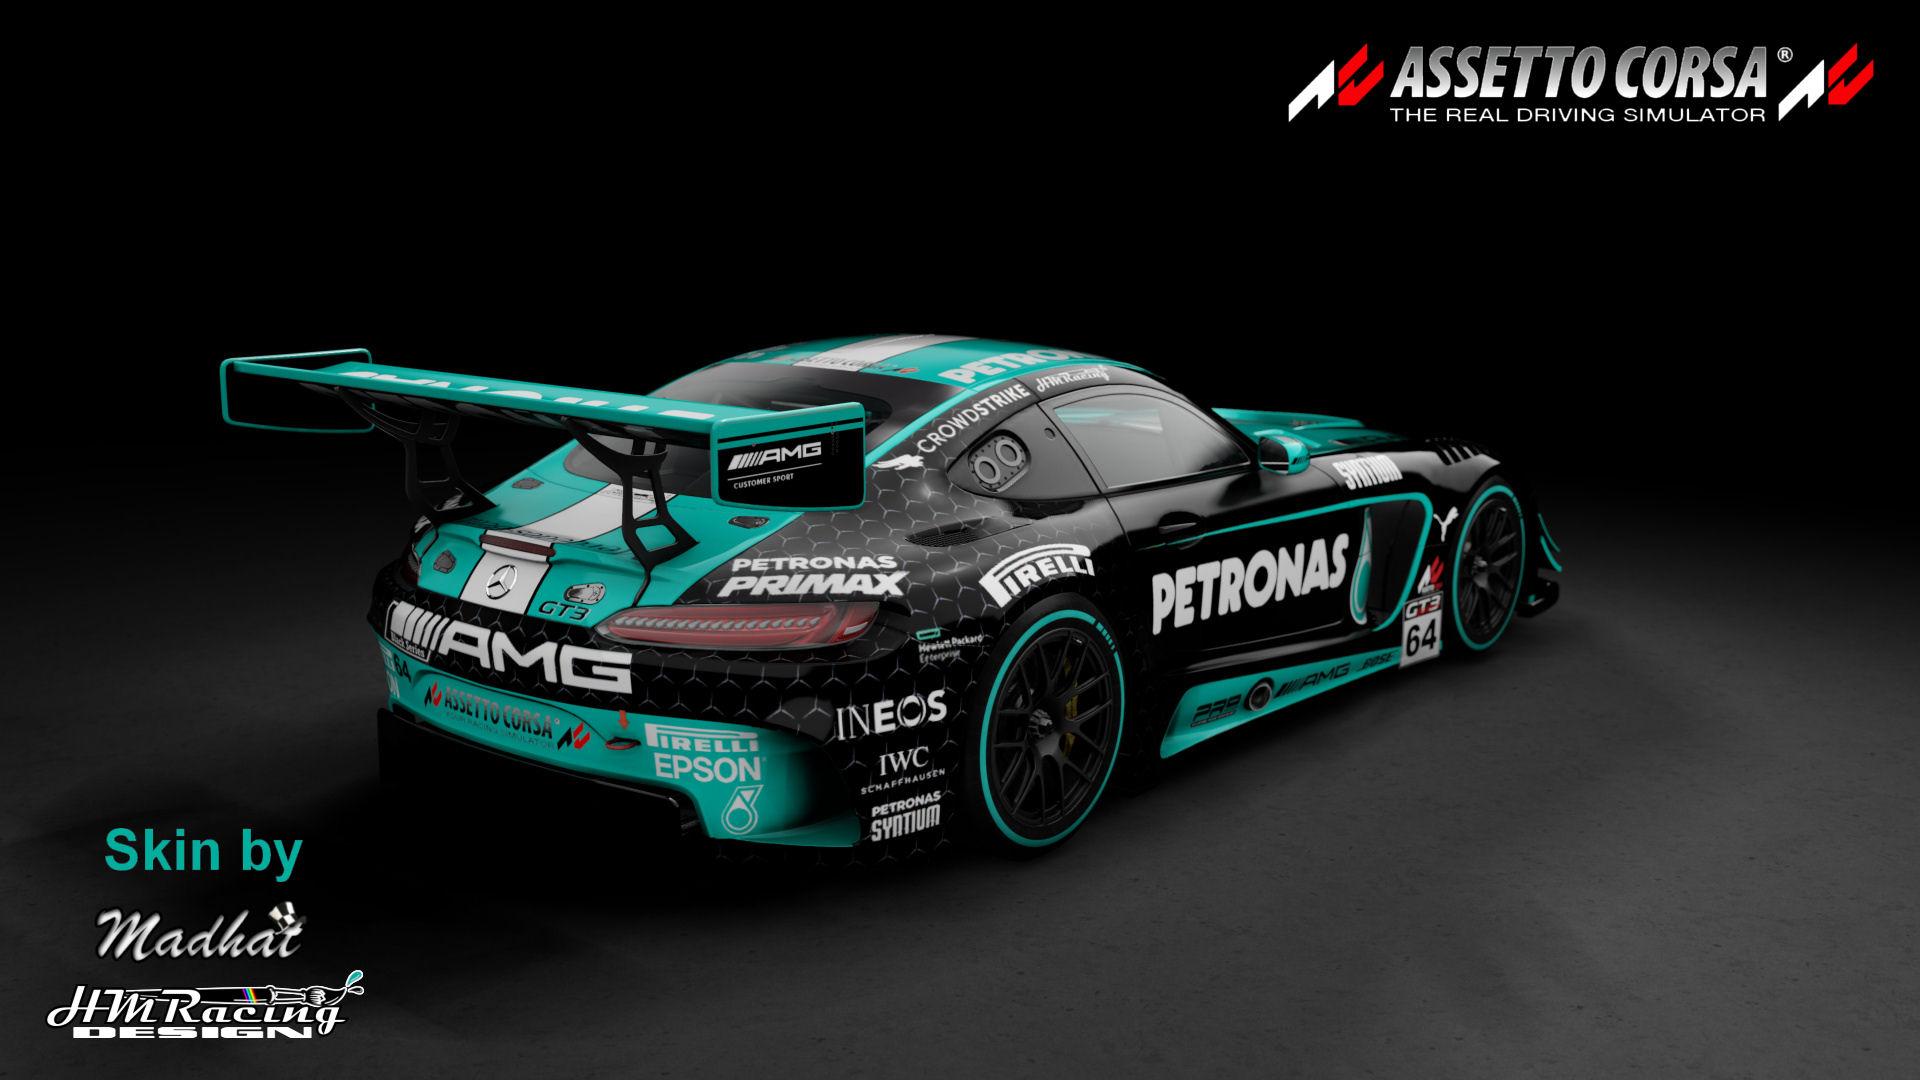 Mercedes AMG GT3 Petronas black 05.jpg